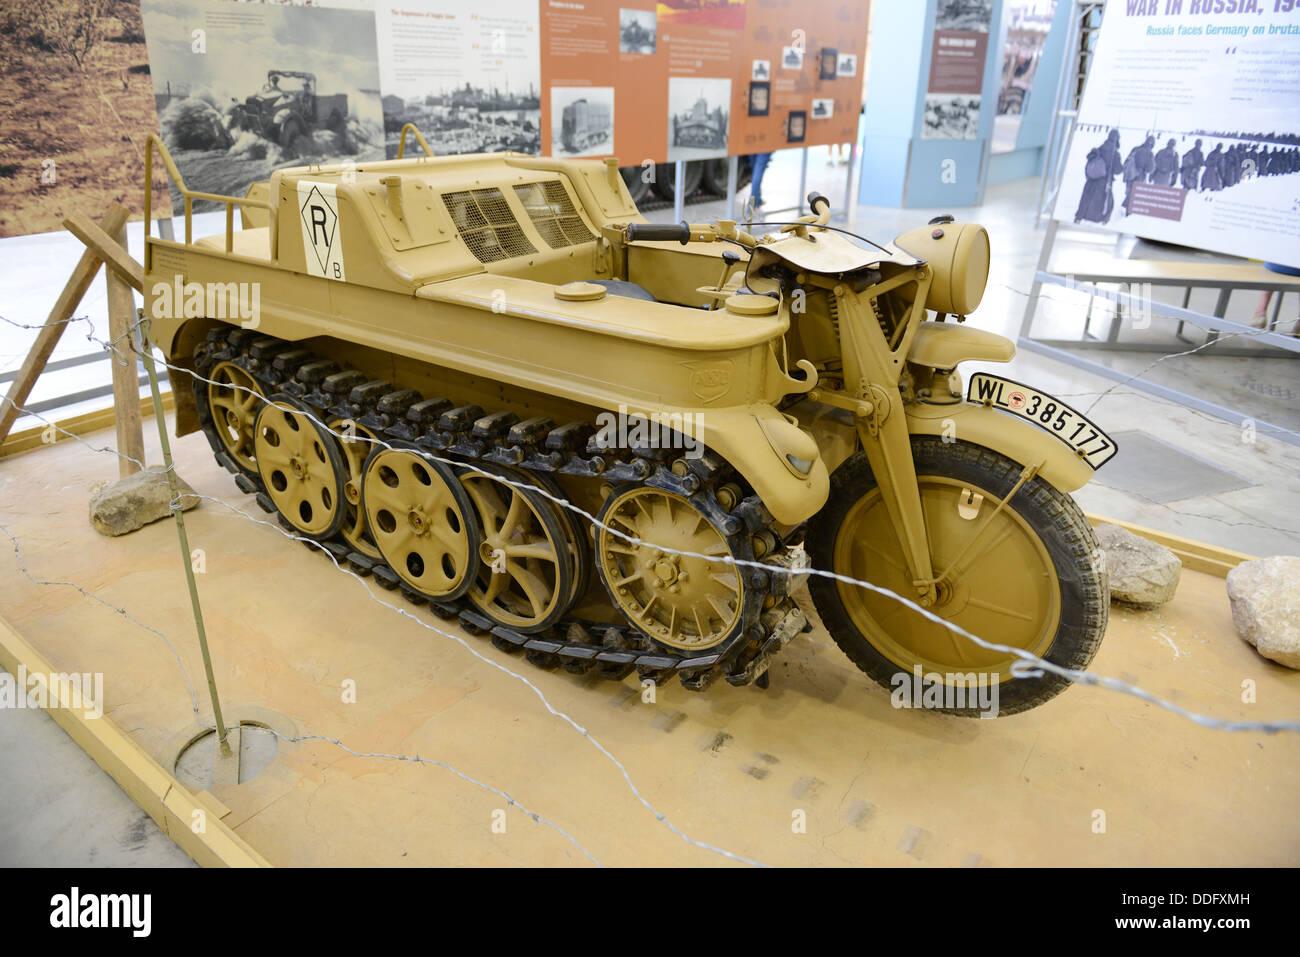 Il Tedesco SdKfz 2 O Kleines Kettenkraftrad HK 101 Kettenkrad Motociclo A Mezza Via Veicolo Militare